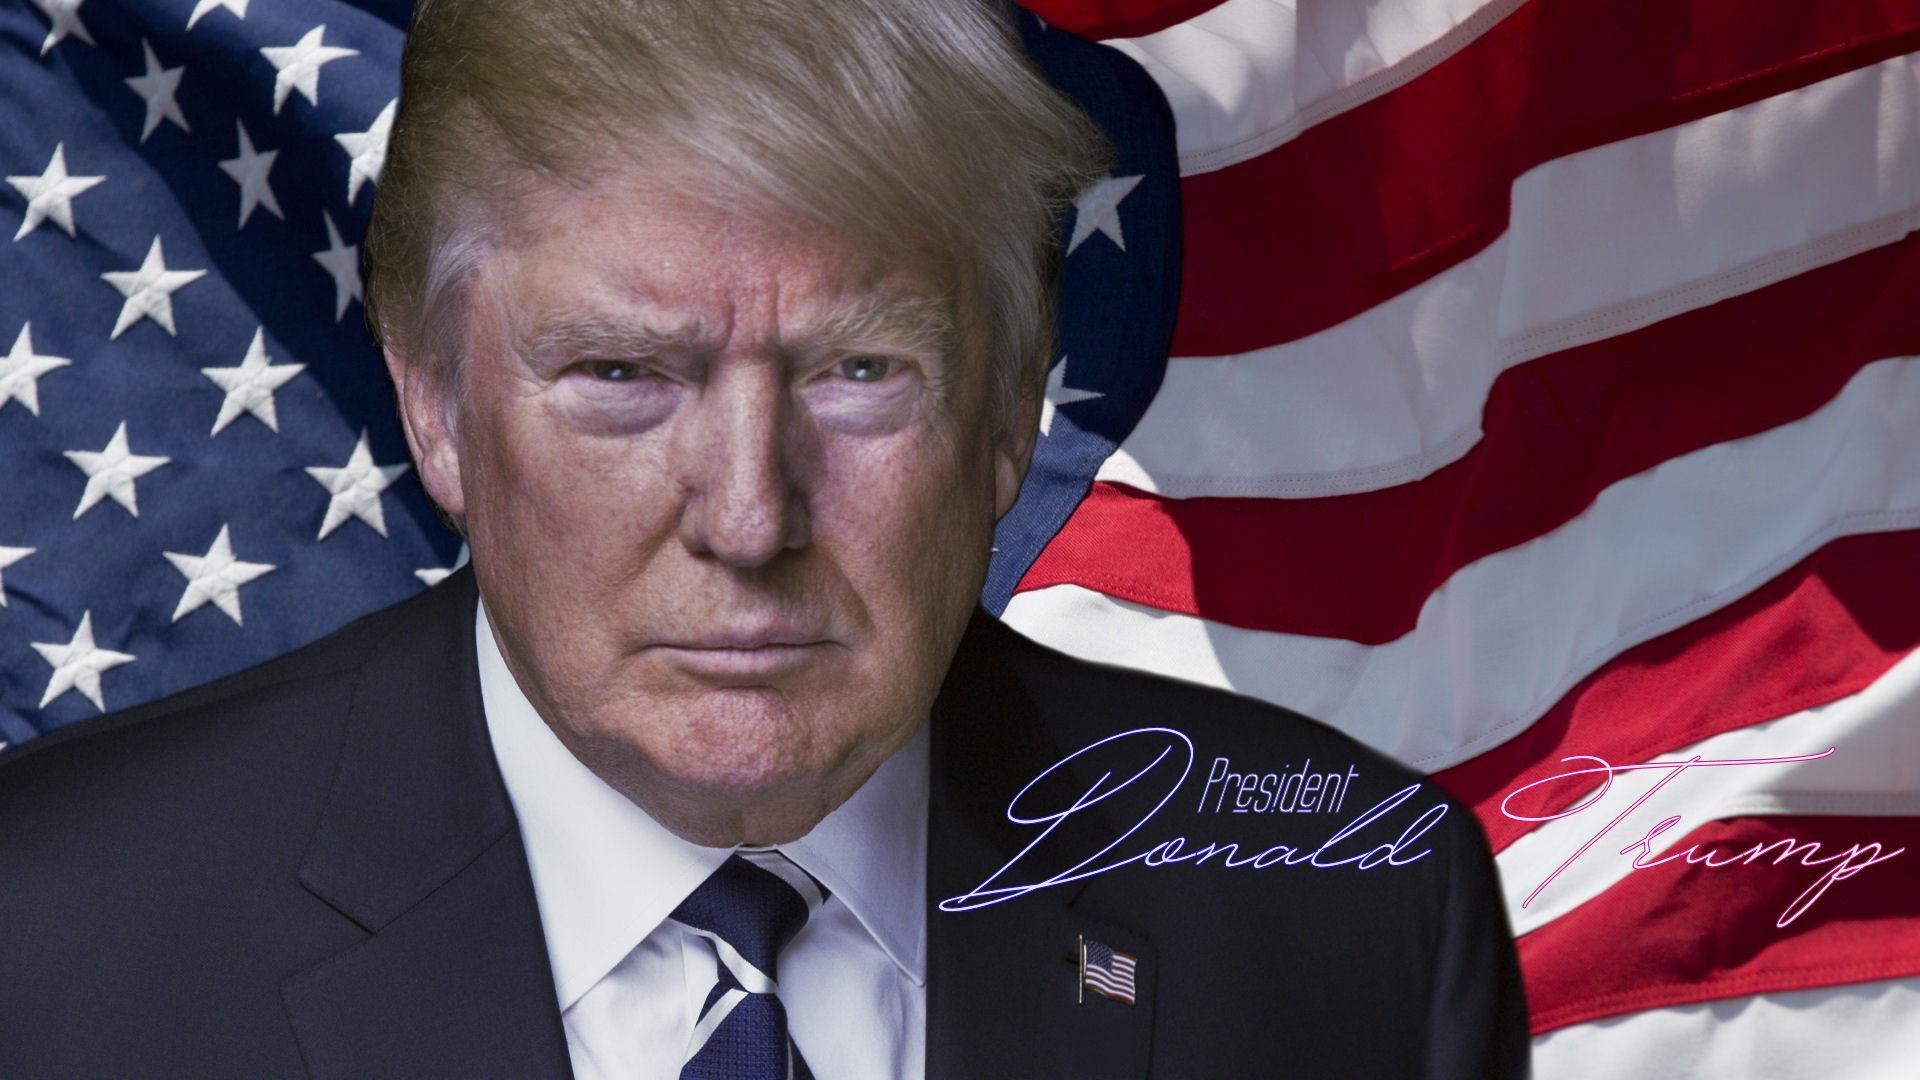 Donald Trump Images President Donald Trump Hd Wallpaper And